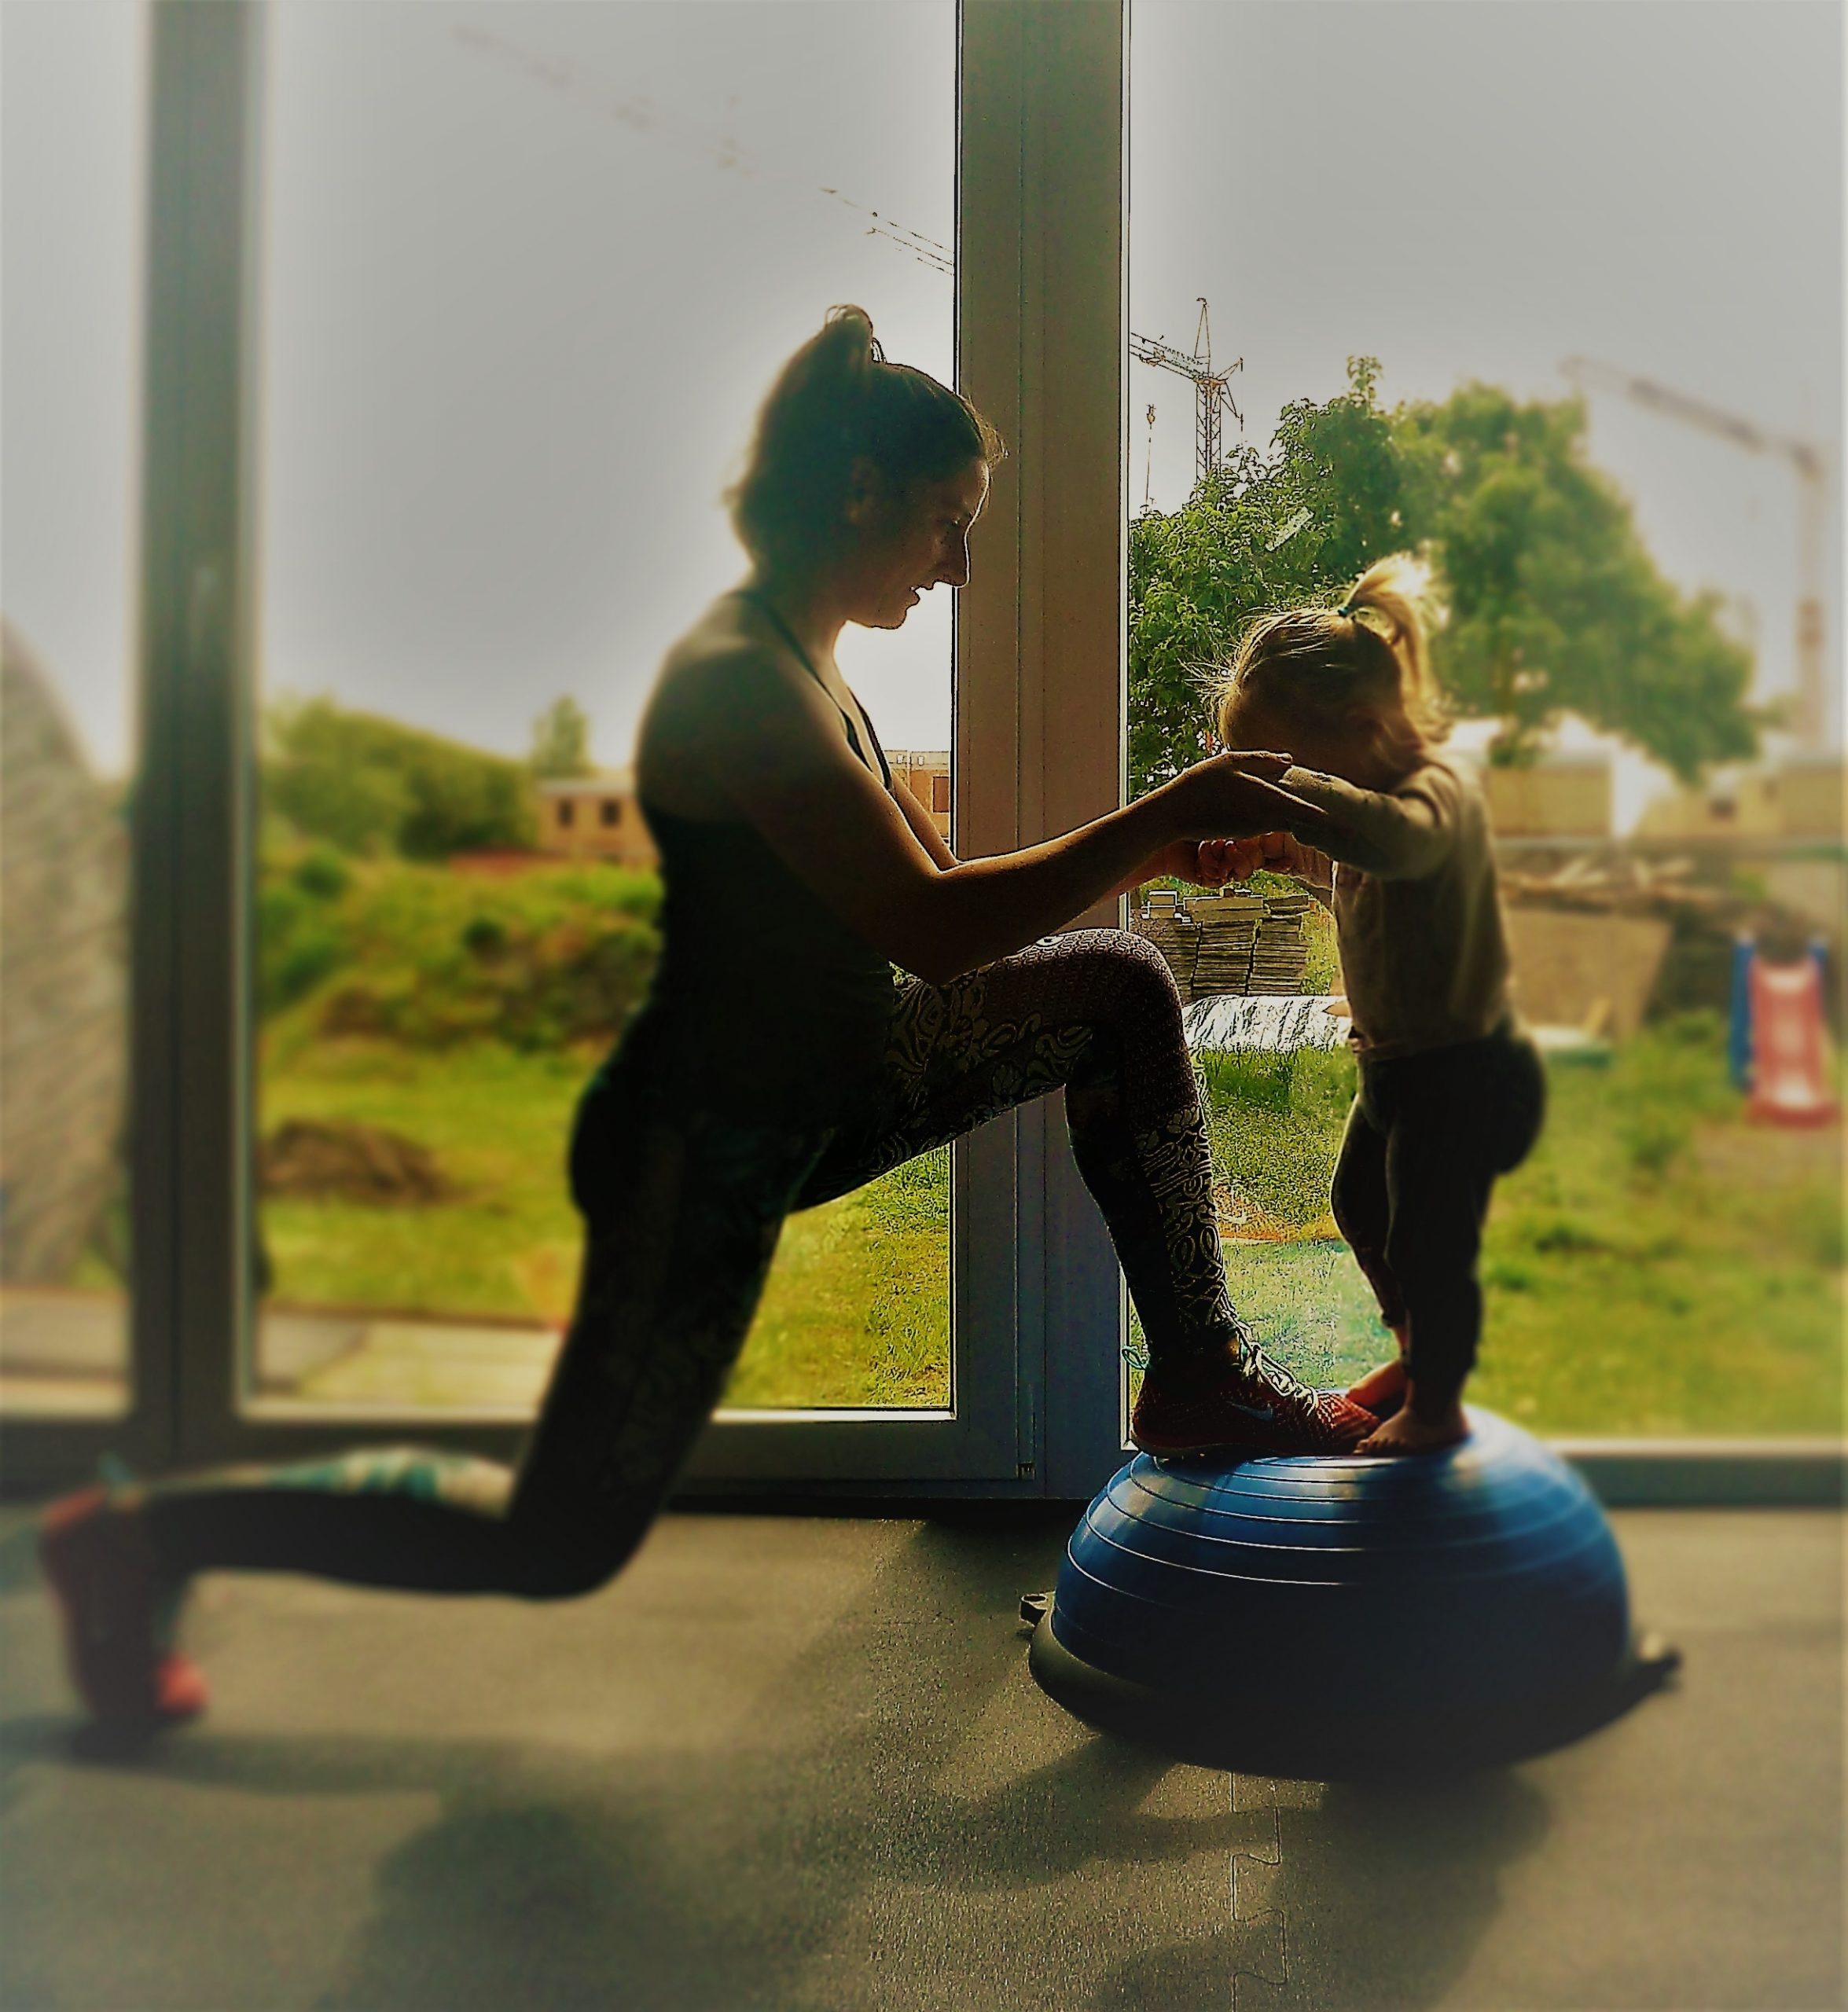 fitness of personal training lombardsijde middelkerke nieuwpoort